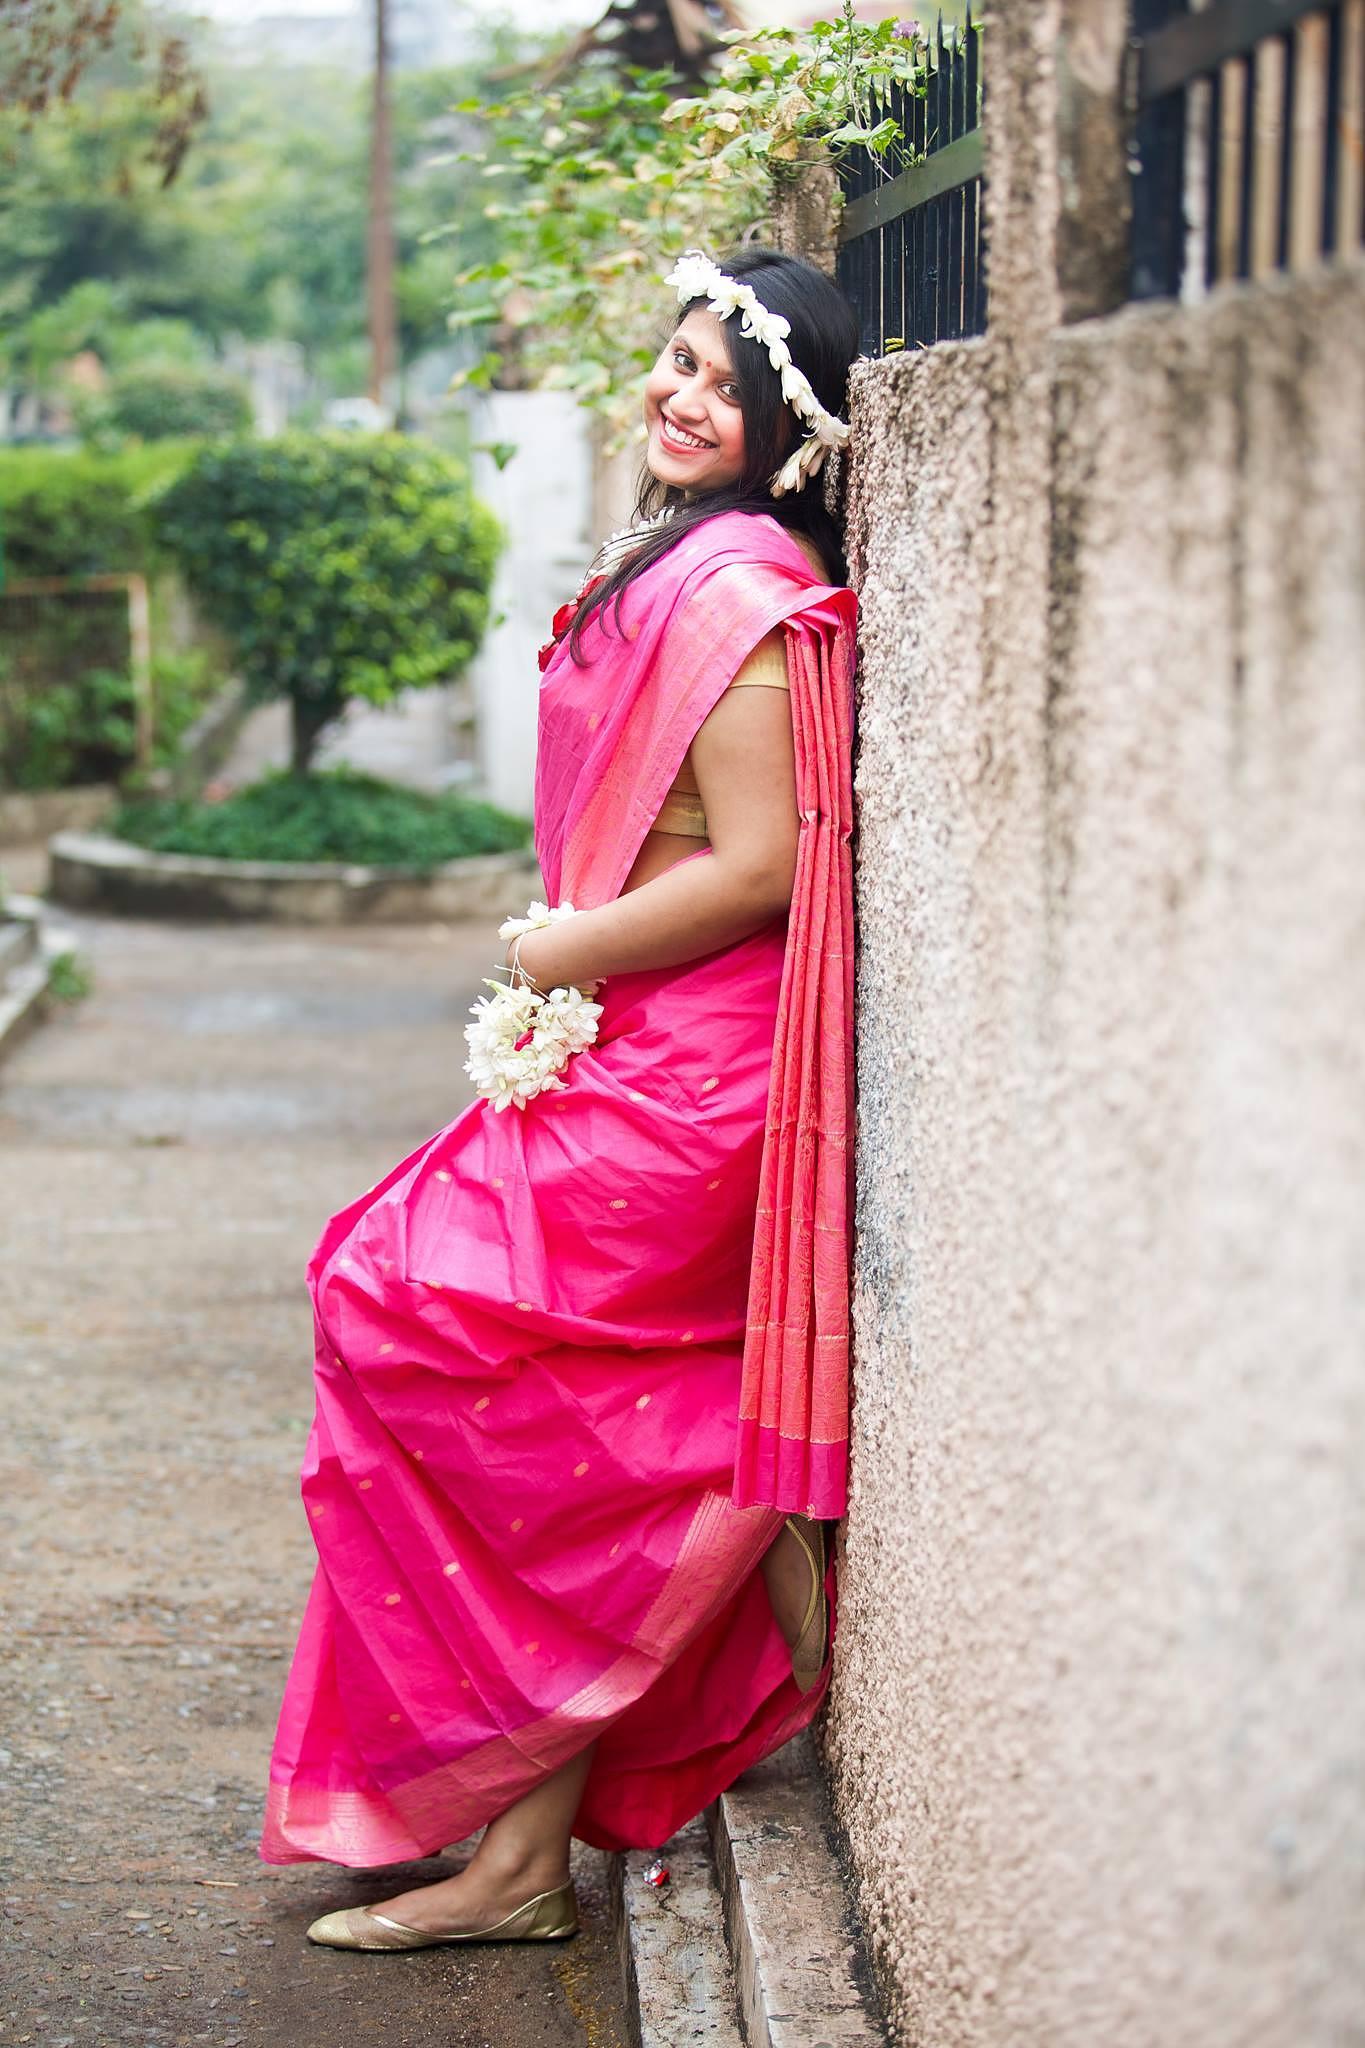 Inner Beauty of a Woman by Shrey Ansh